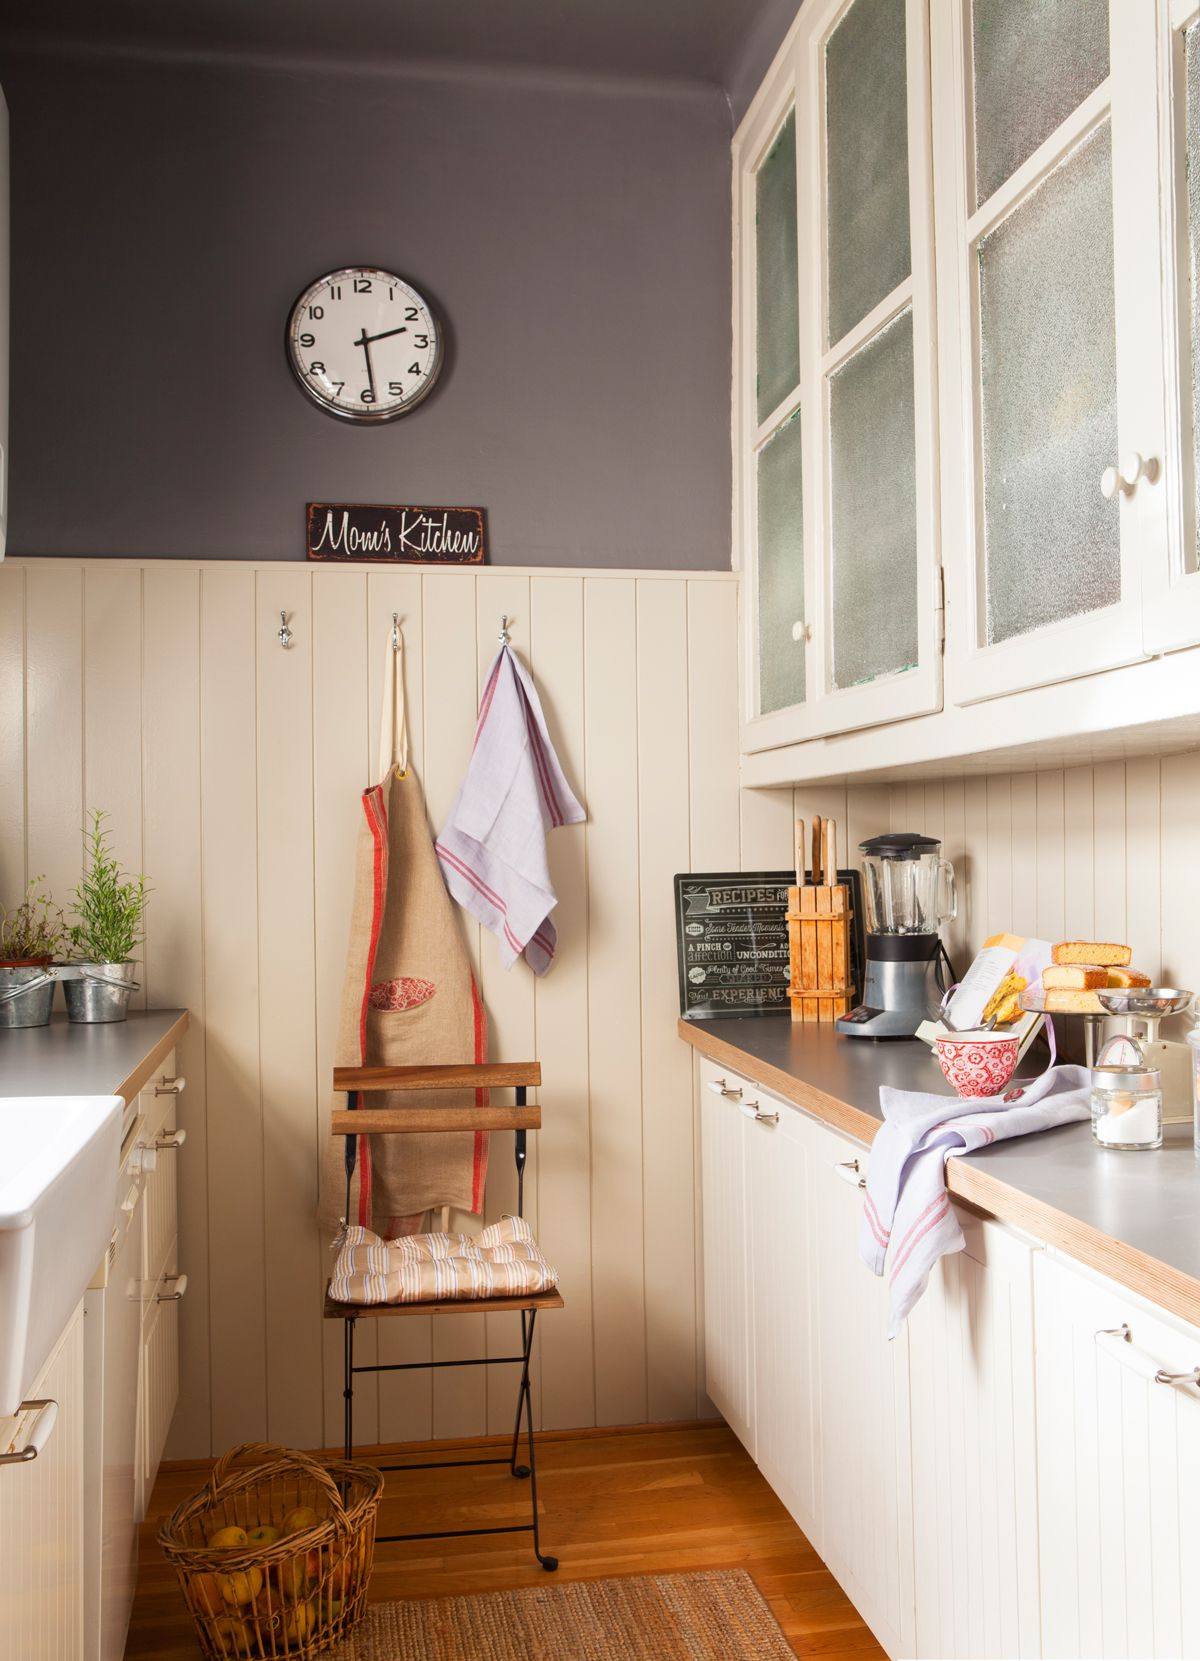 Cocina pequeña en dos frentes, con arrimadero de madera y vitrina ...